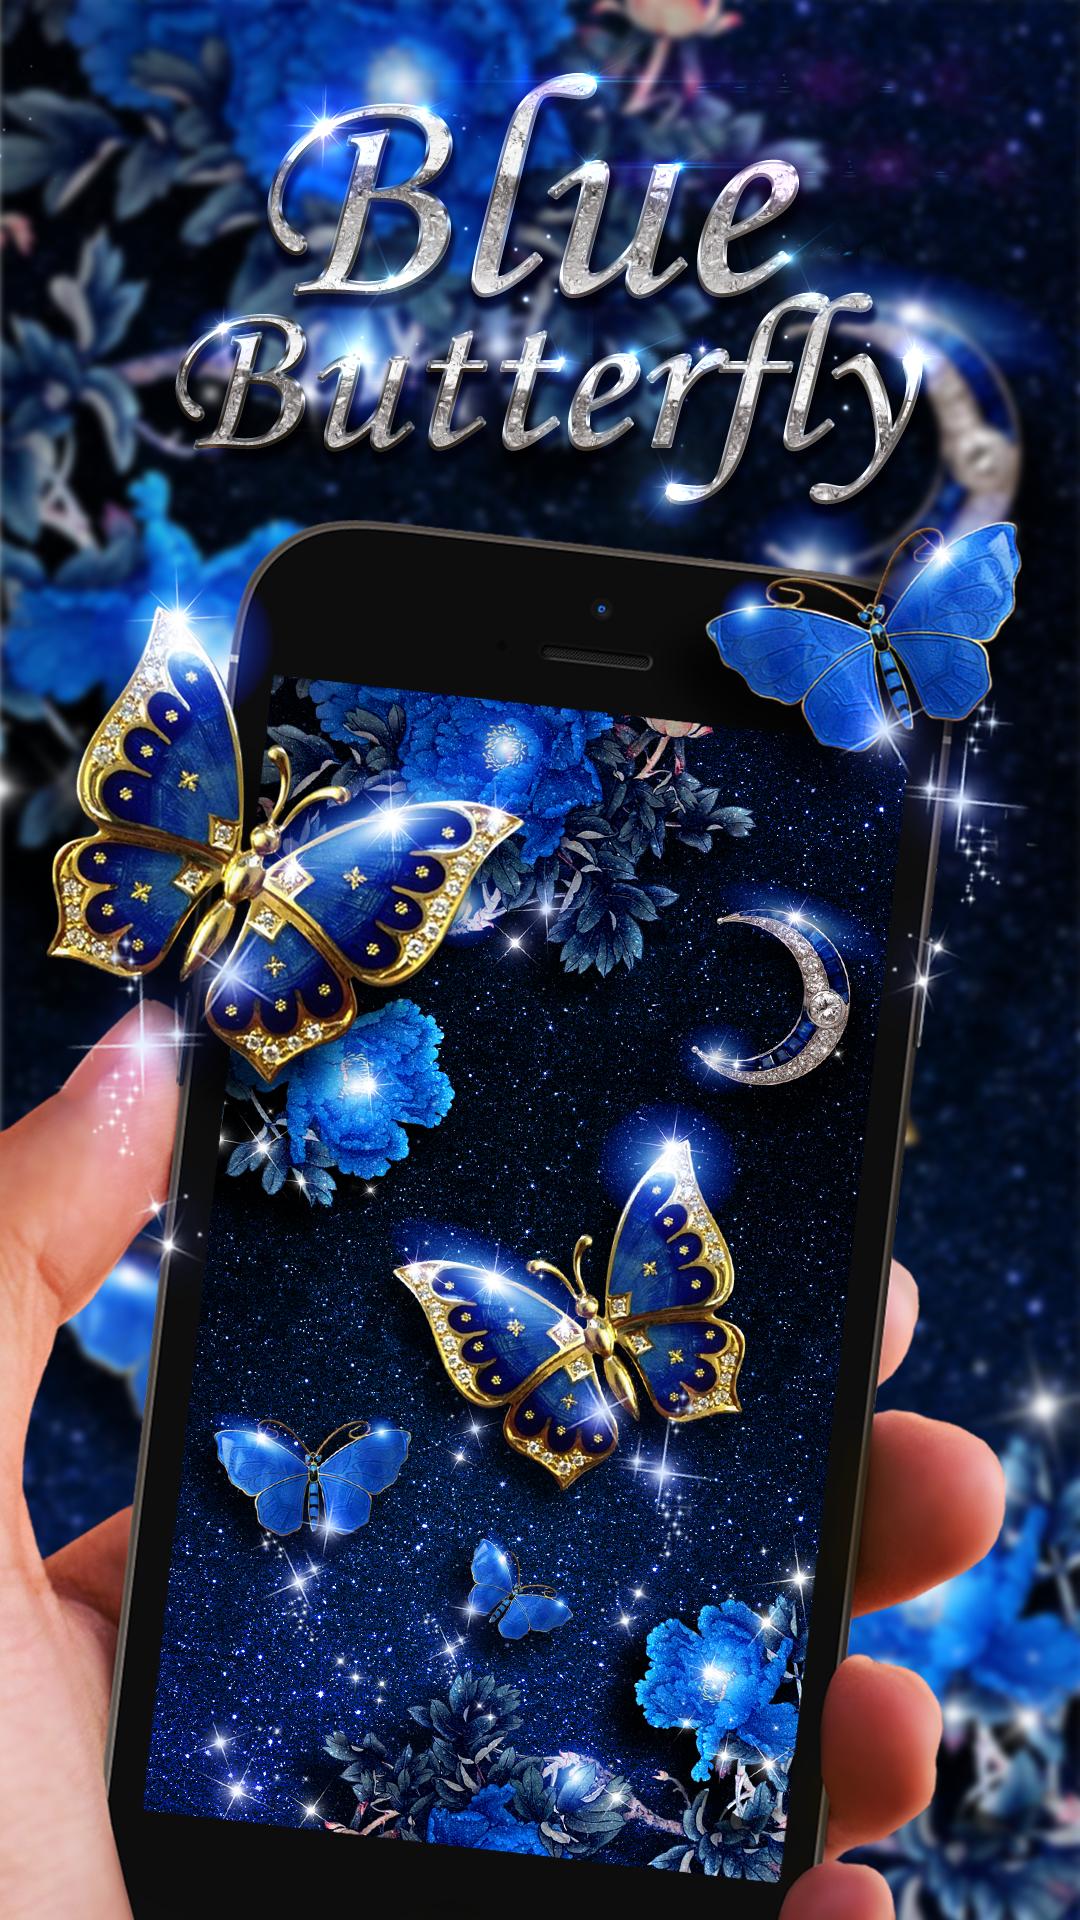 Blue butterfly live wallpaper!   Butterfly wallpaper, Live ...